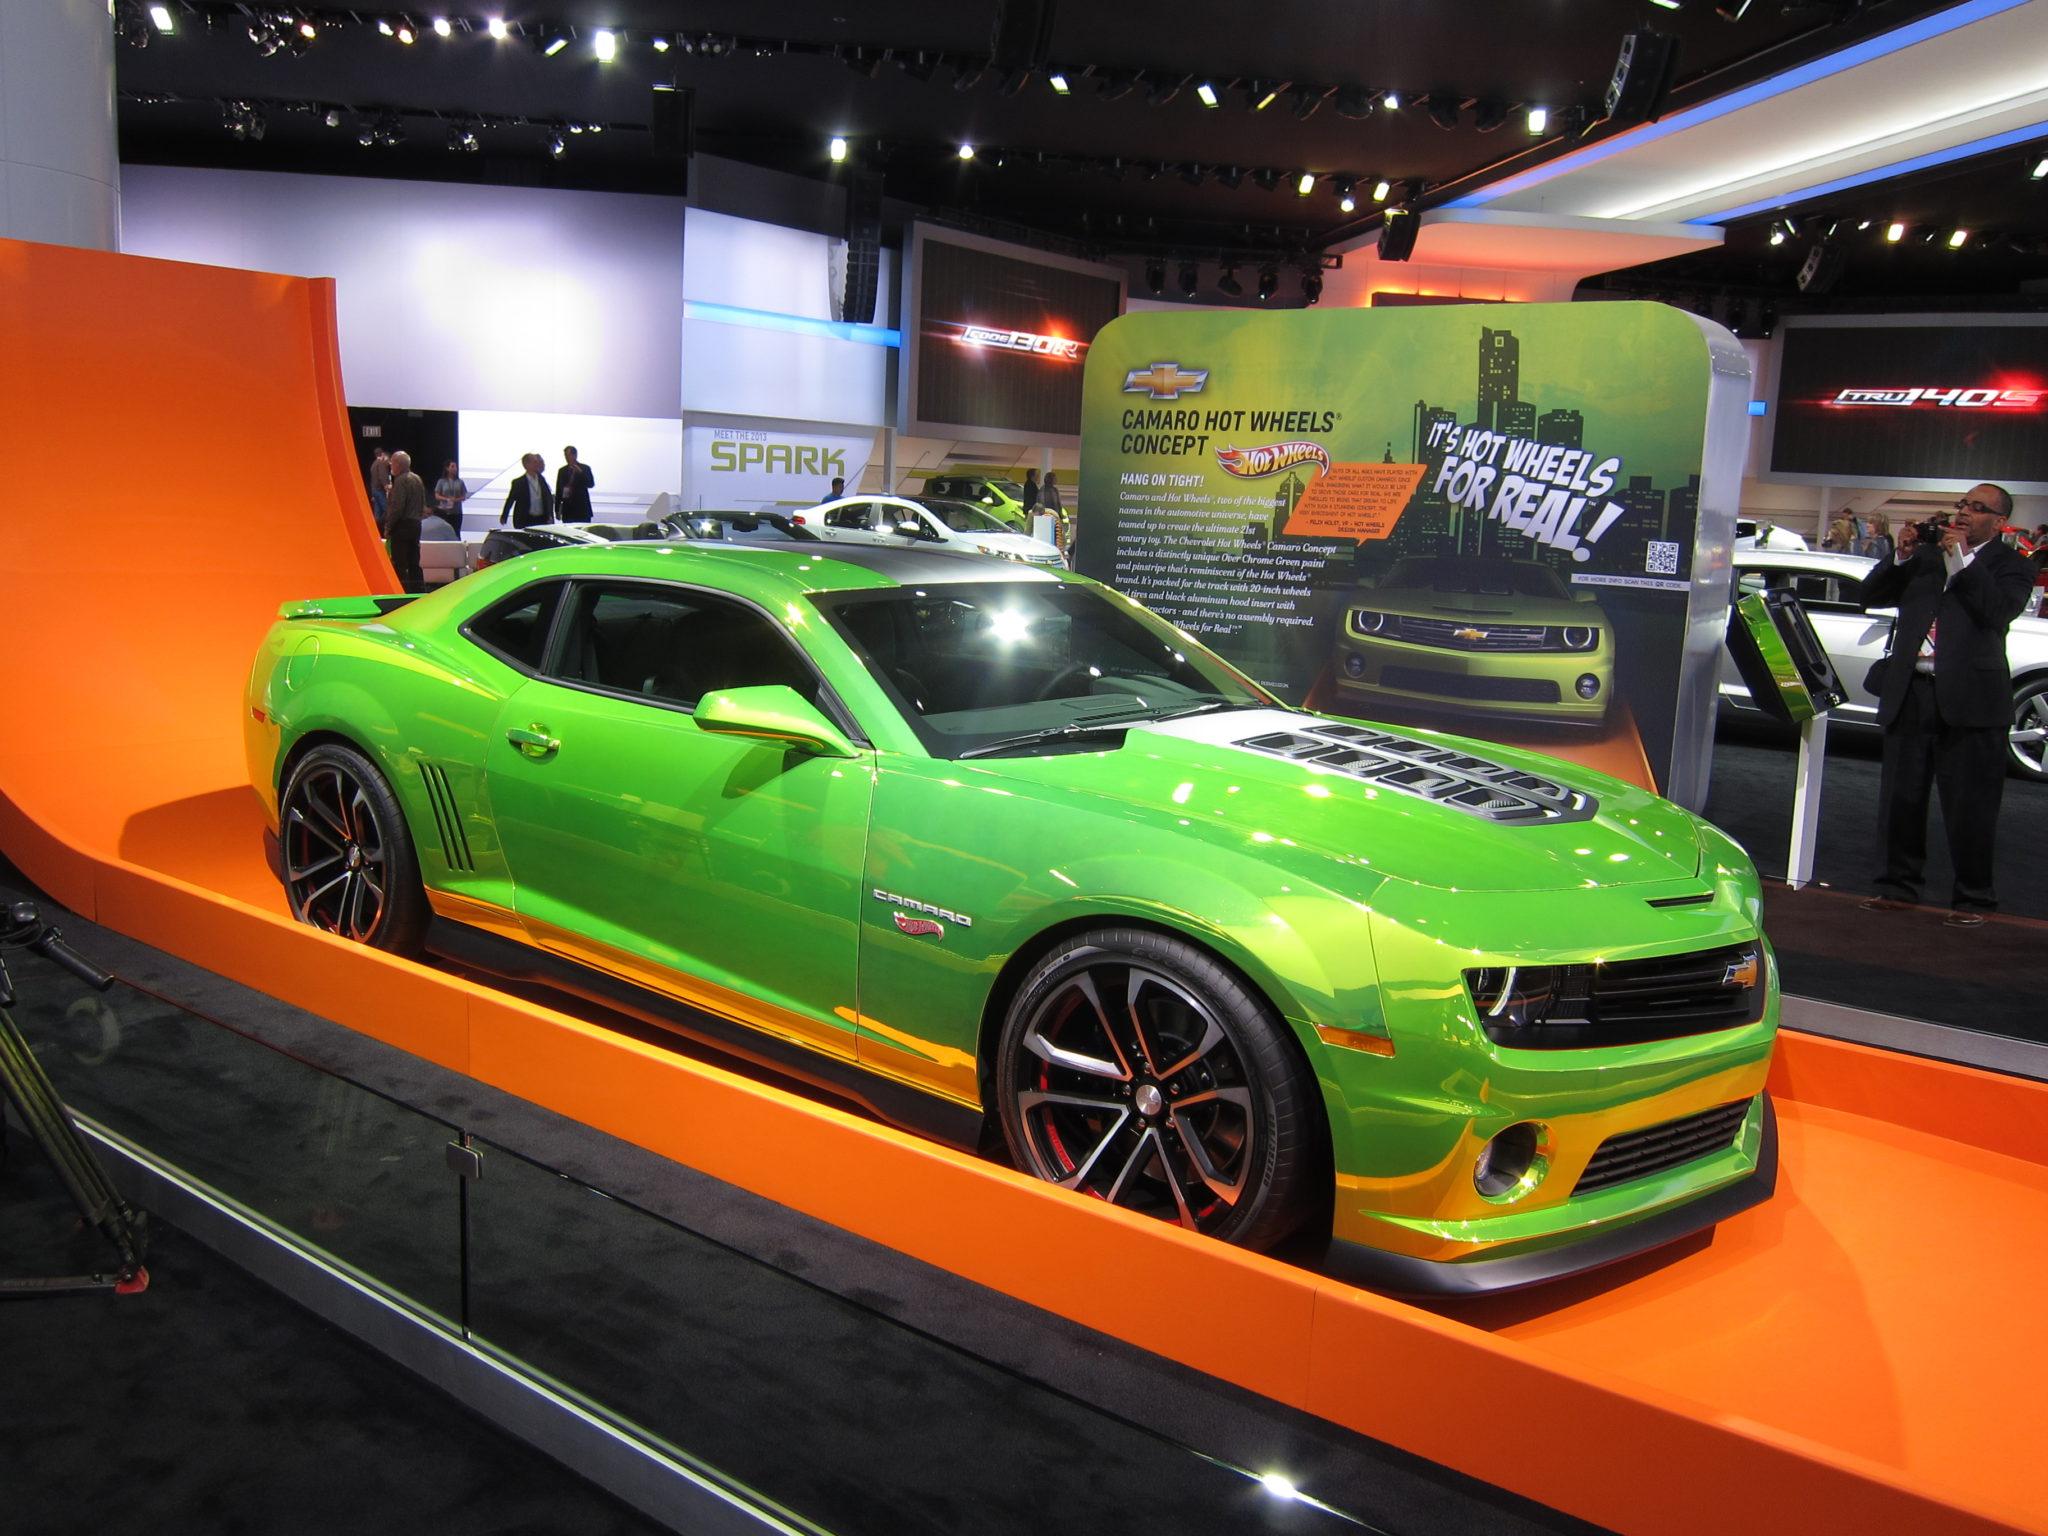 Chevrolet Camaro, Hot Wheels Edition, 2012 Detroit Auto Show